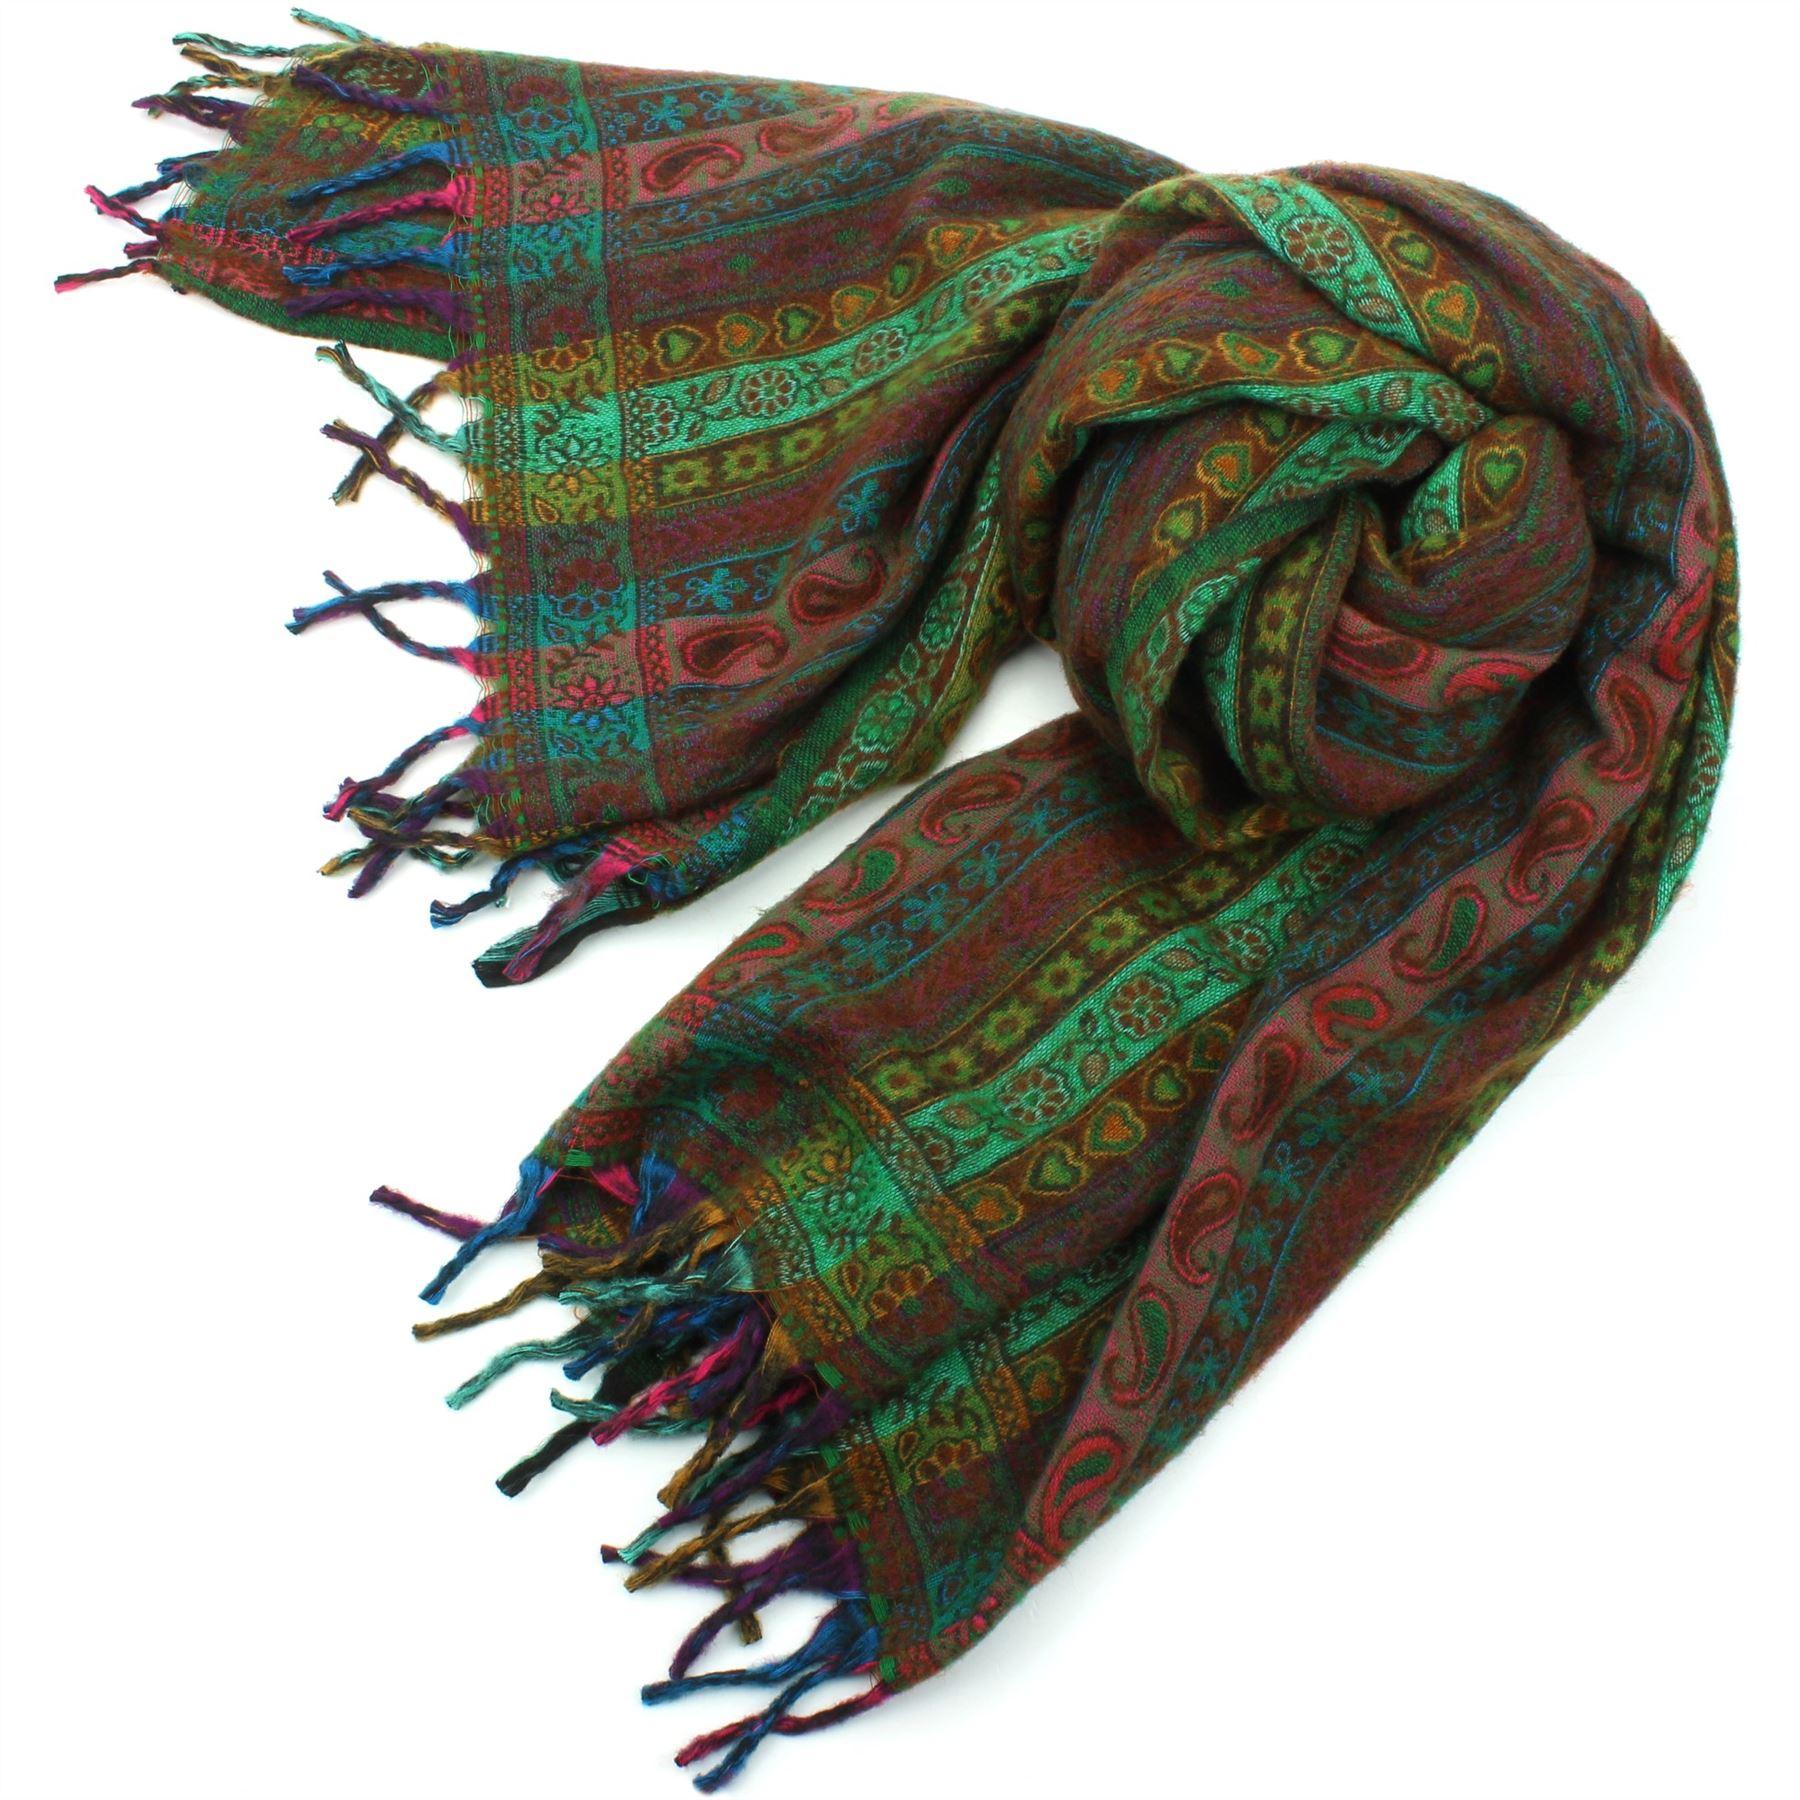 Acrylic-Wool-Blanket-Shawl-Wrap-Throw-Finest-Softest-India-Stripe-Paisley-Travel thumbnail 17